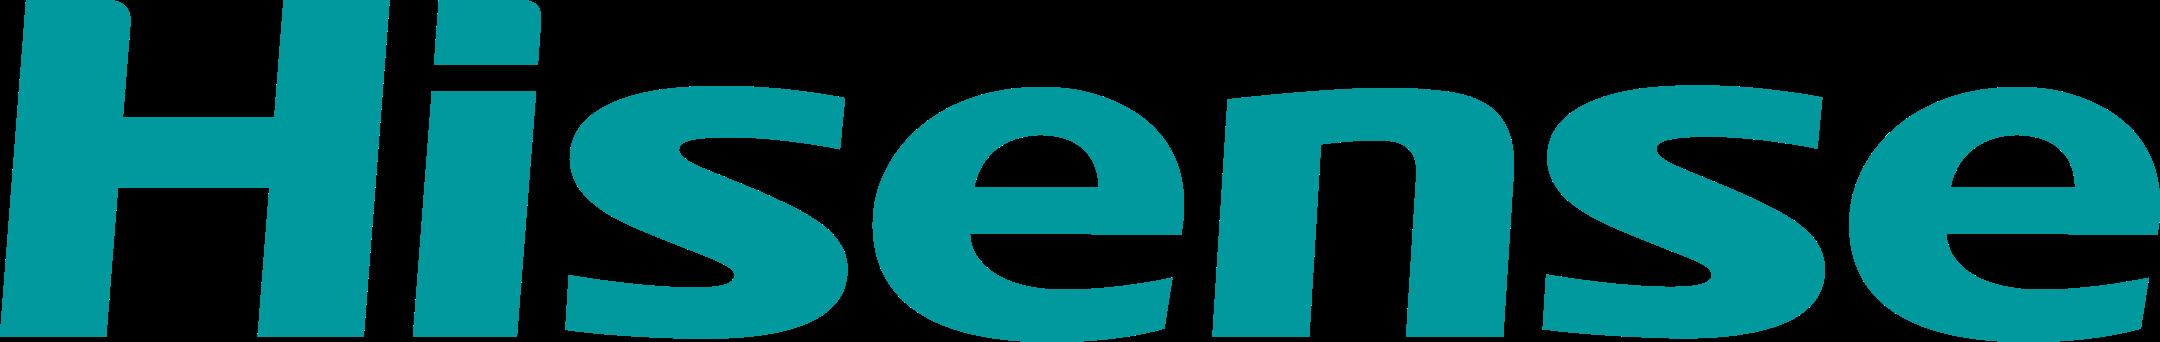 hisense logo 1 - Hisense Logo